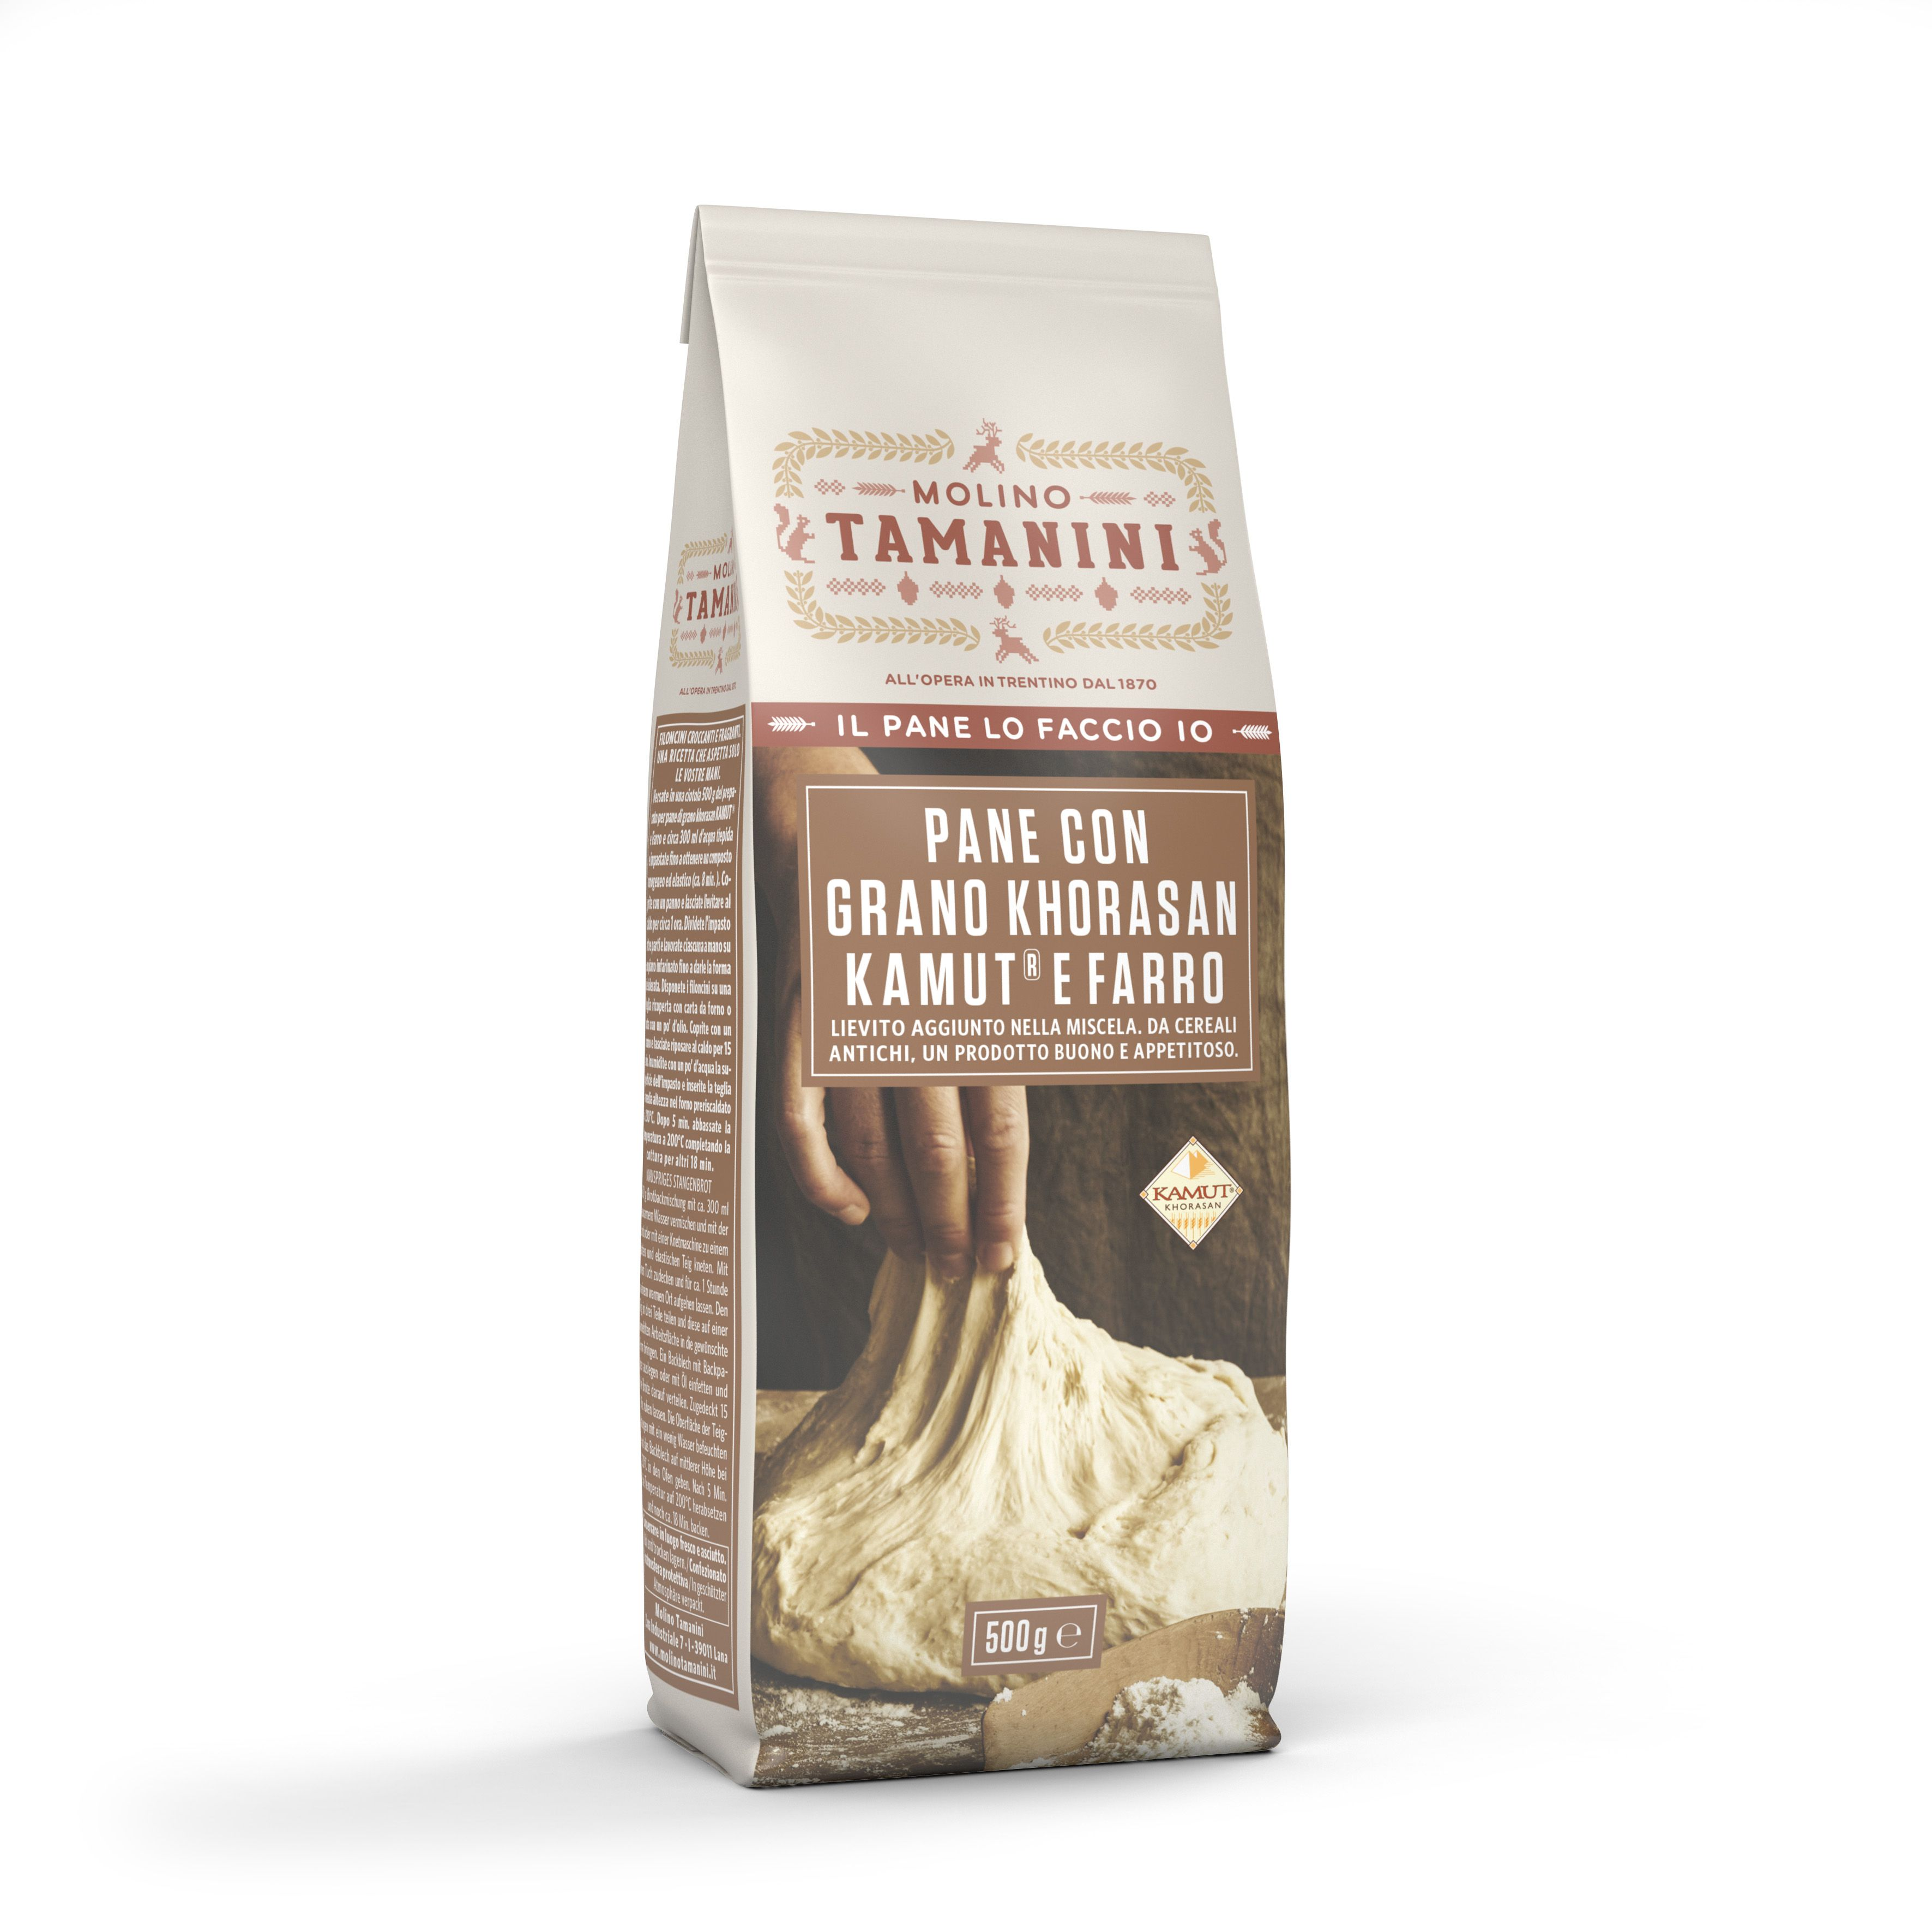 Organic baking mix Kamut® Khorasan and Spelt Bread